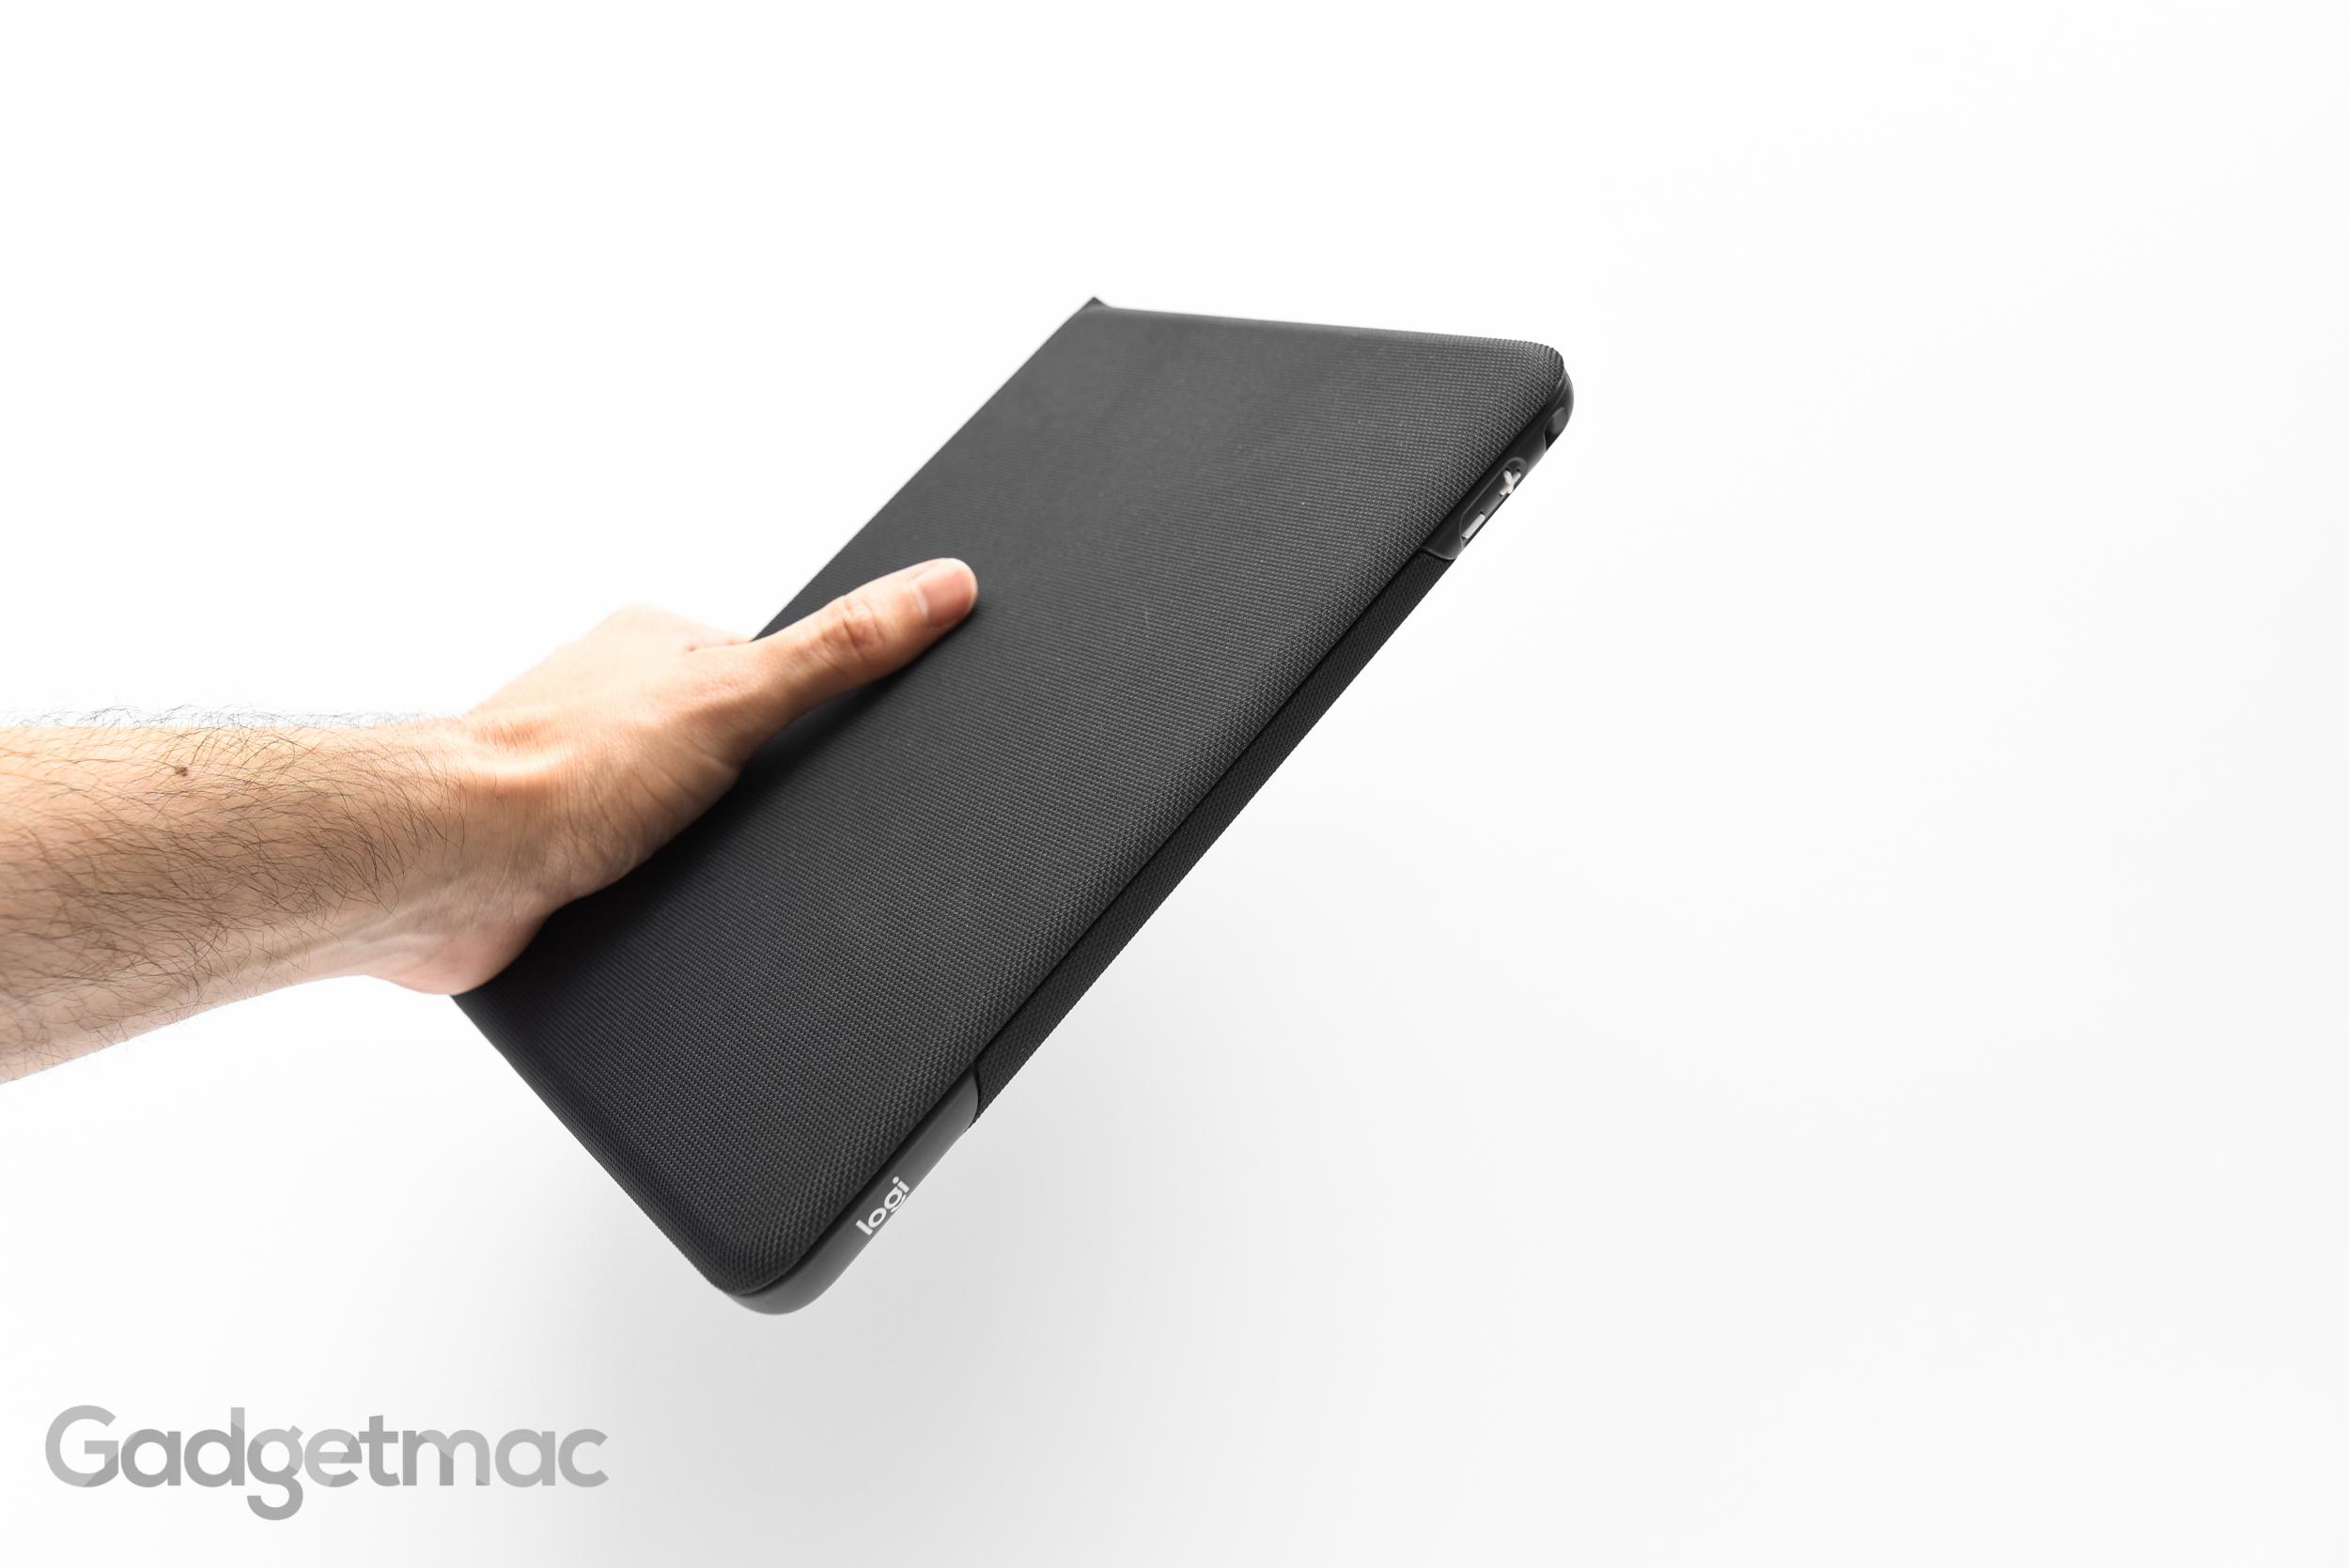 logitech-create-ipad-pro-keyboard-case-slim-profile.jpg